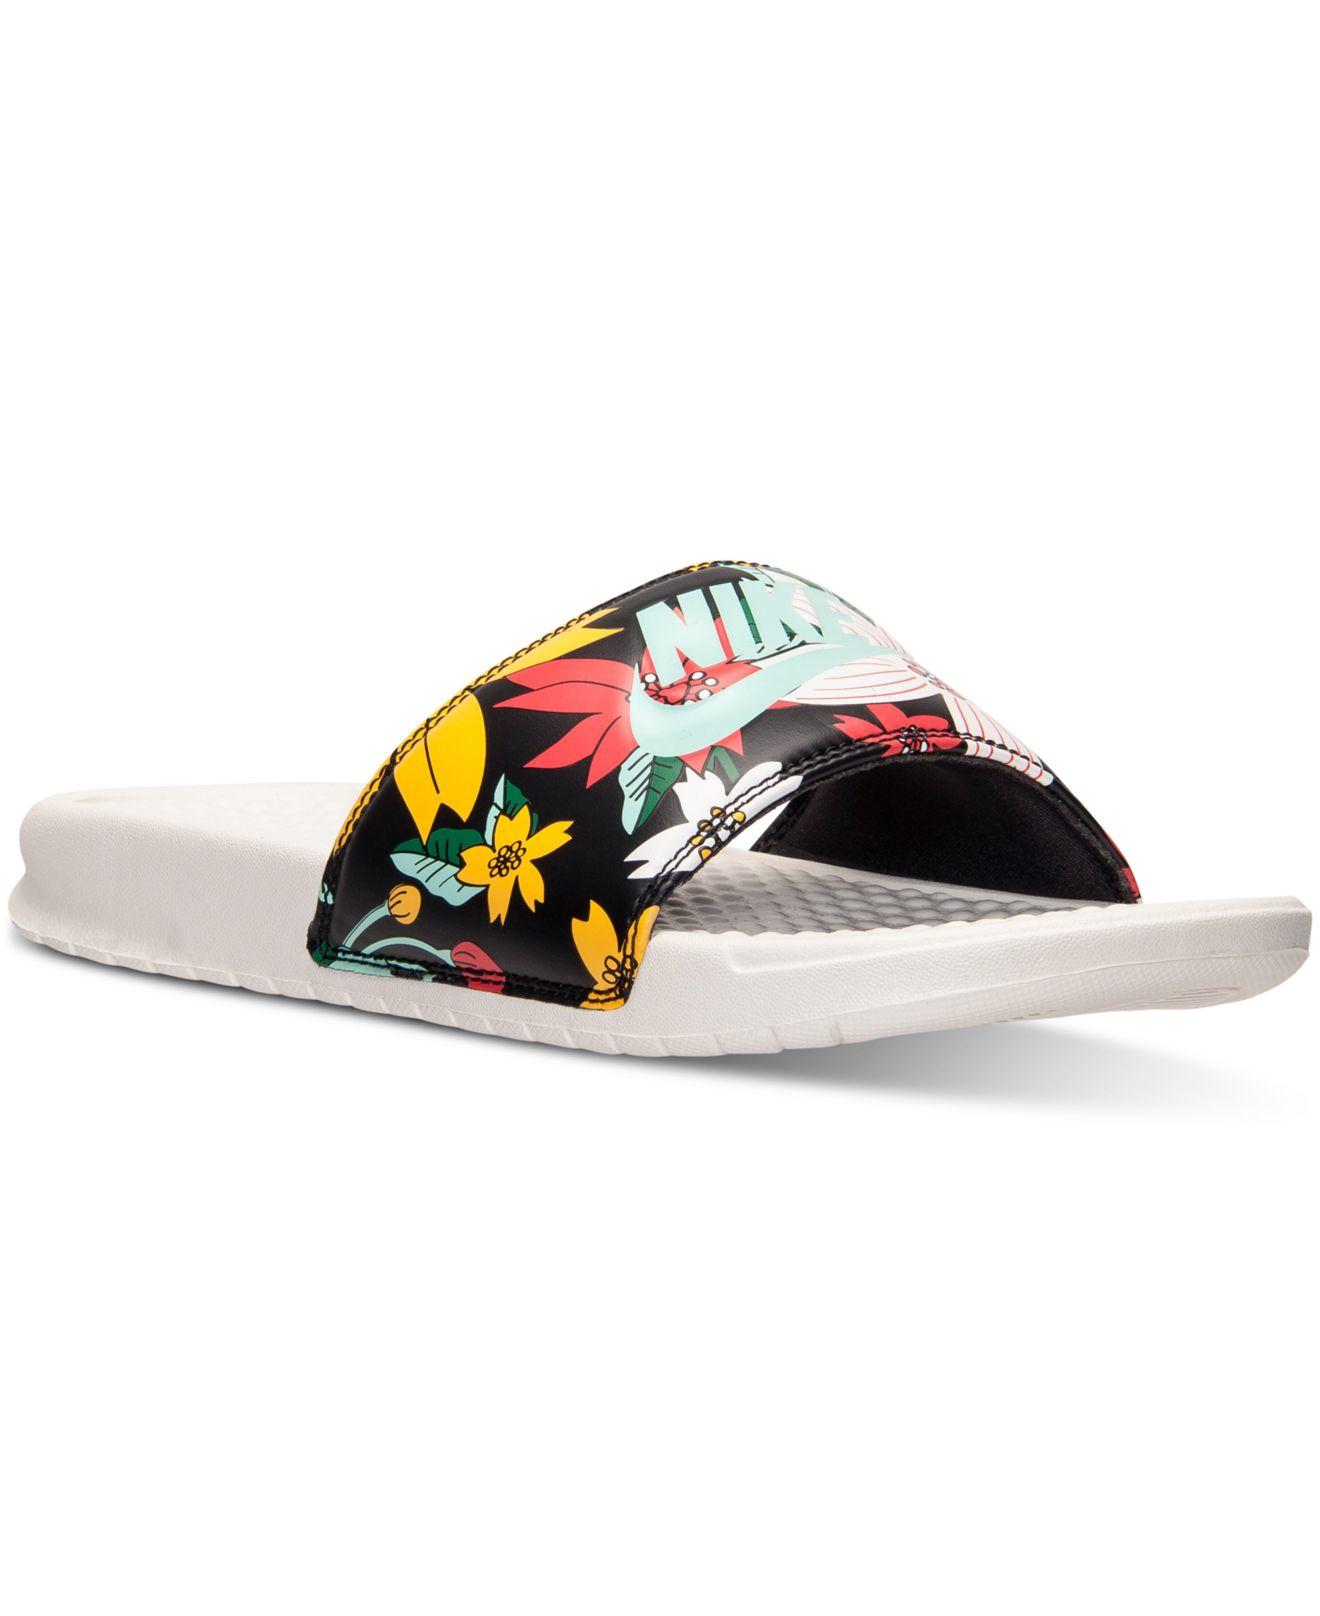 49f72a56be65b Lyst - Nike Women s Benassi Jdi Print Slide Sandals From Finish Line ...